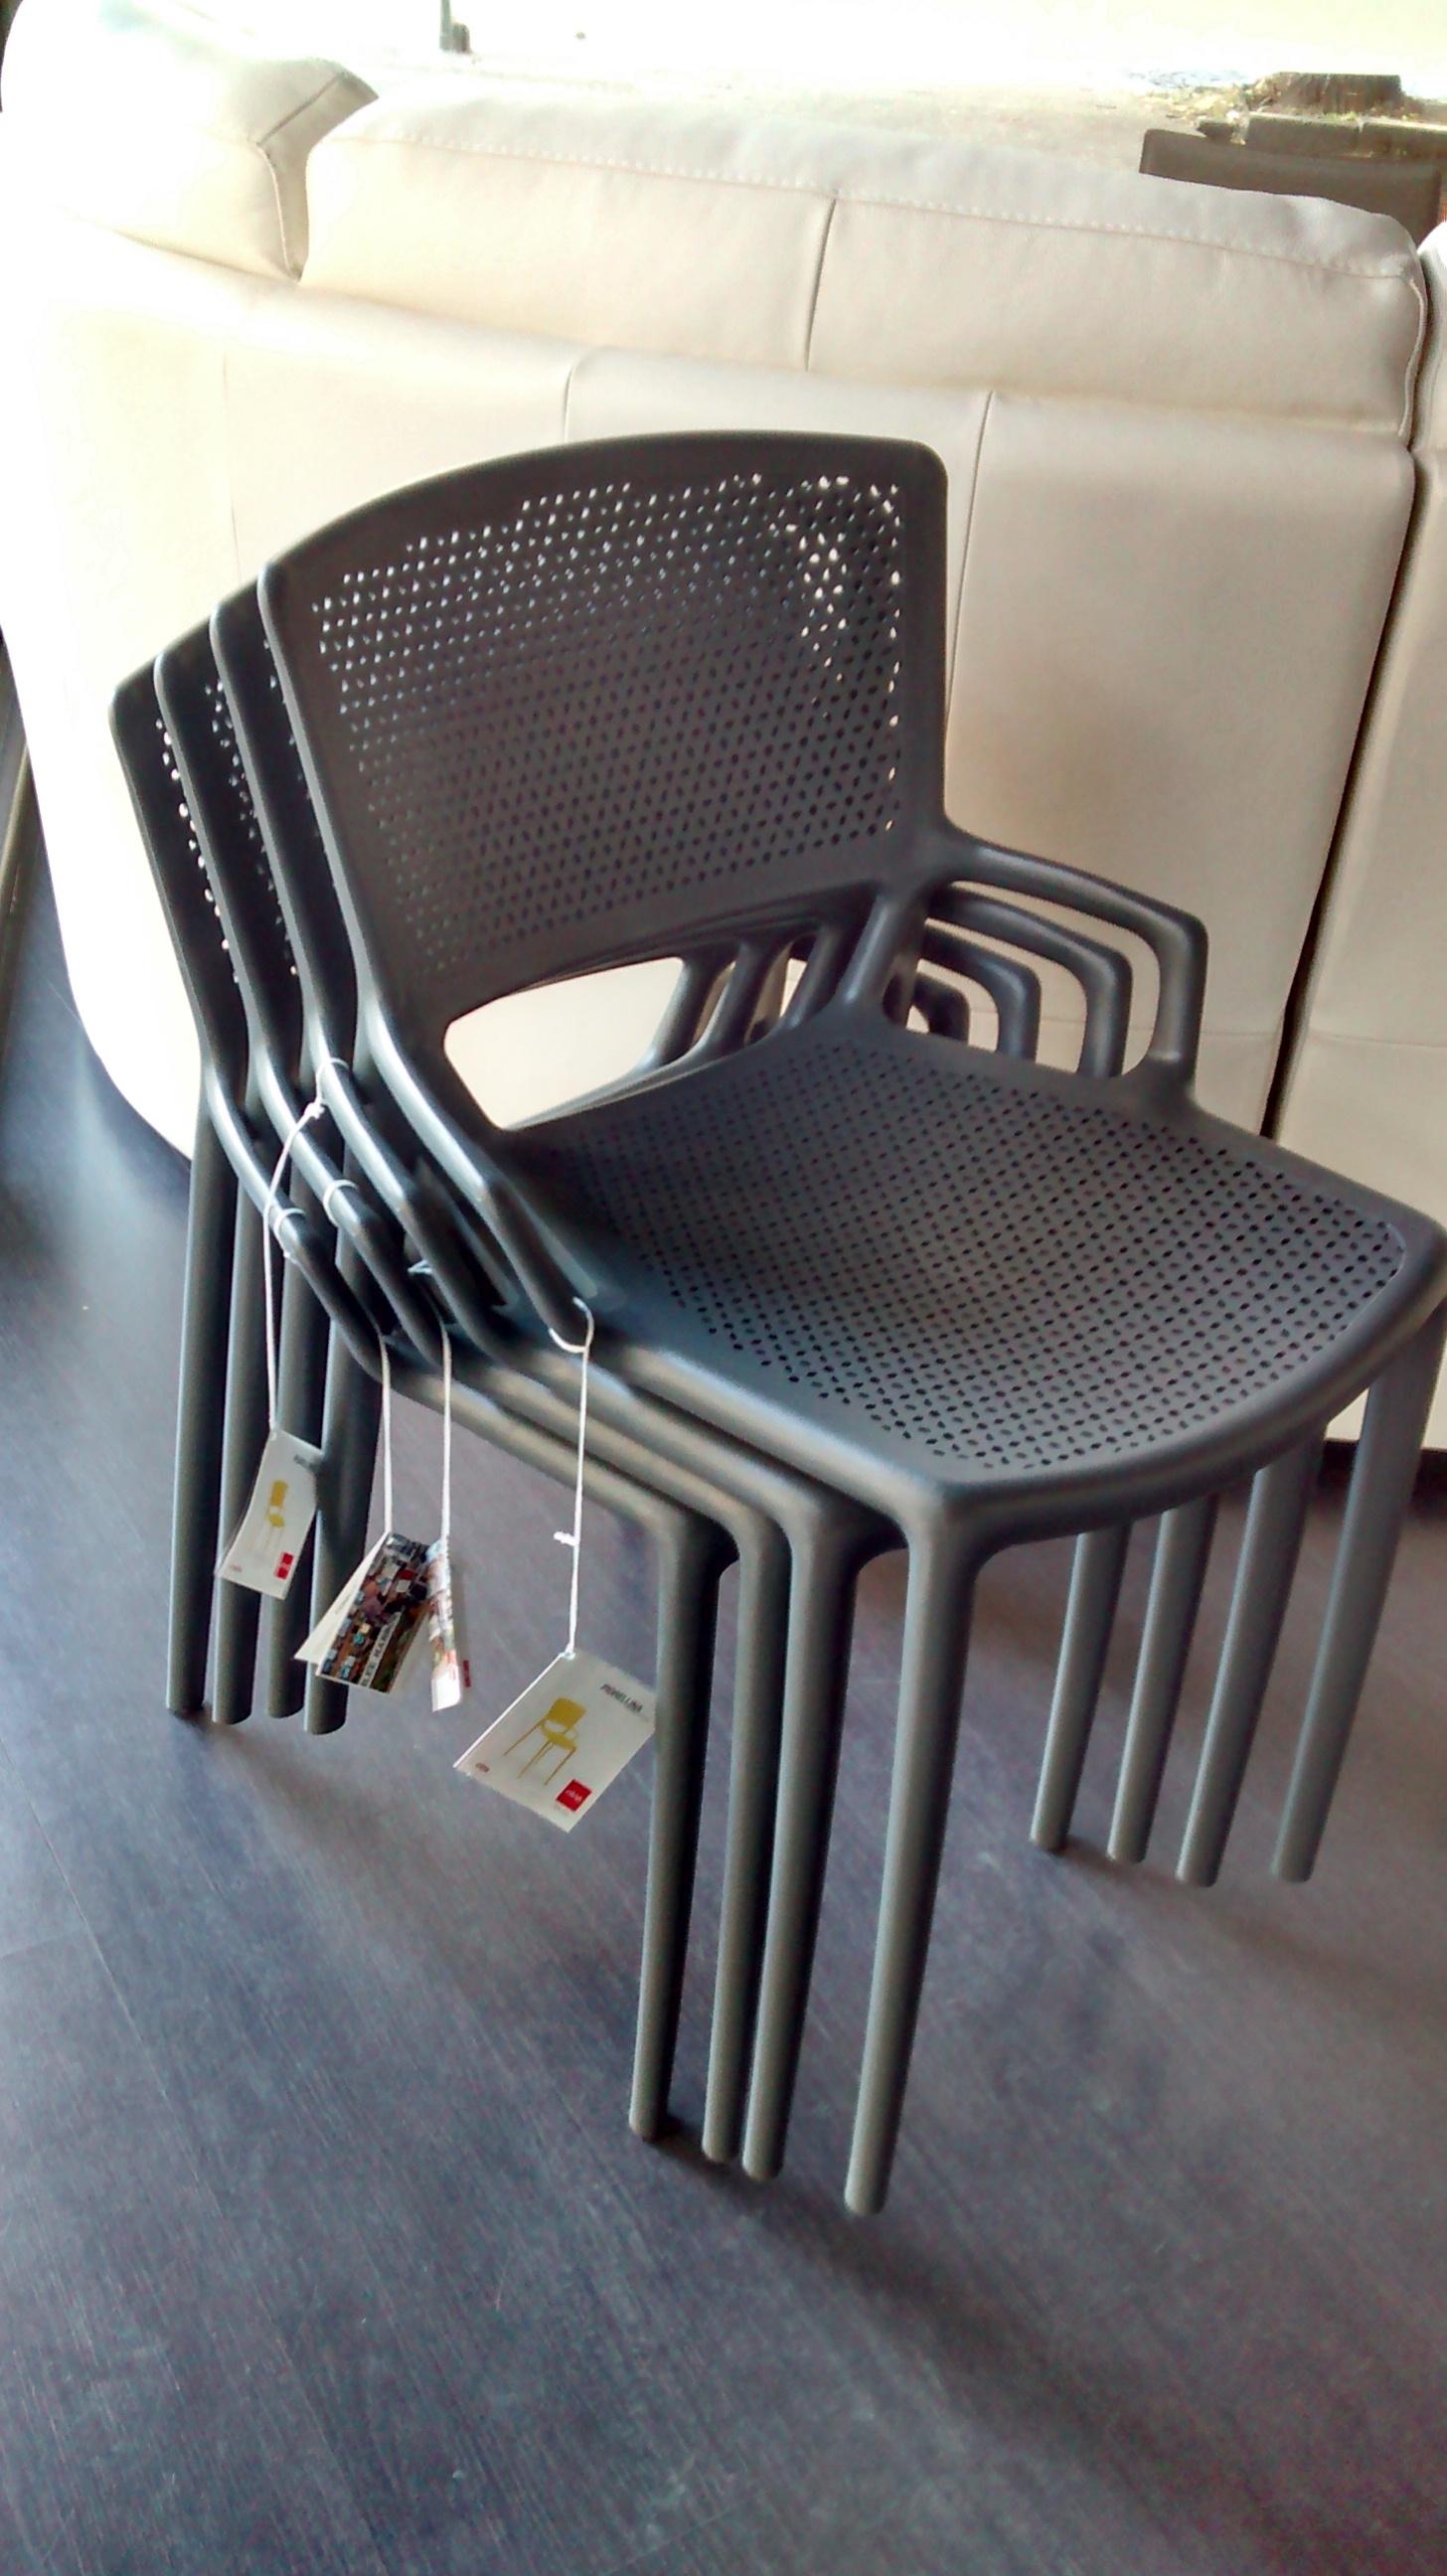 Offerta sedie in polipropilene impilabili 18603 sedie a for Sedie impilabili